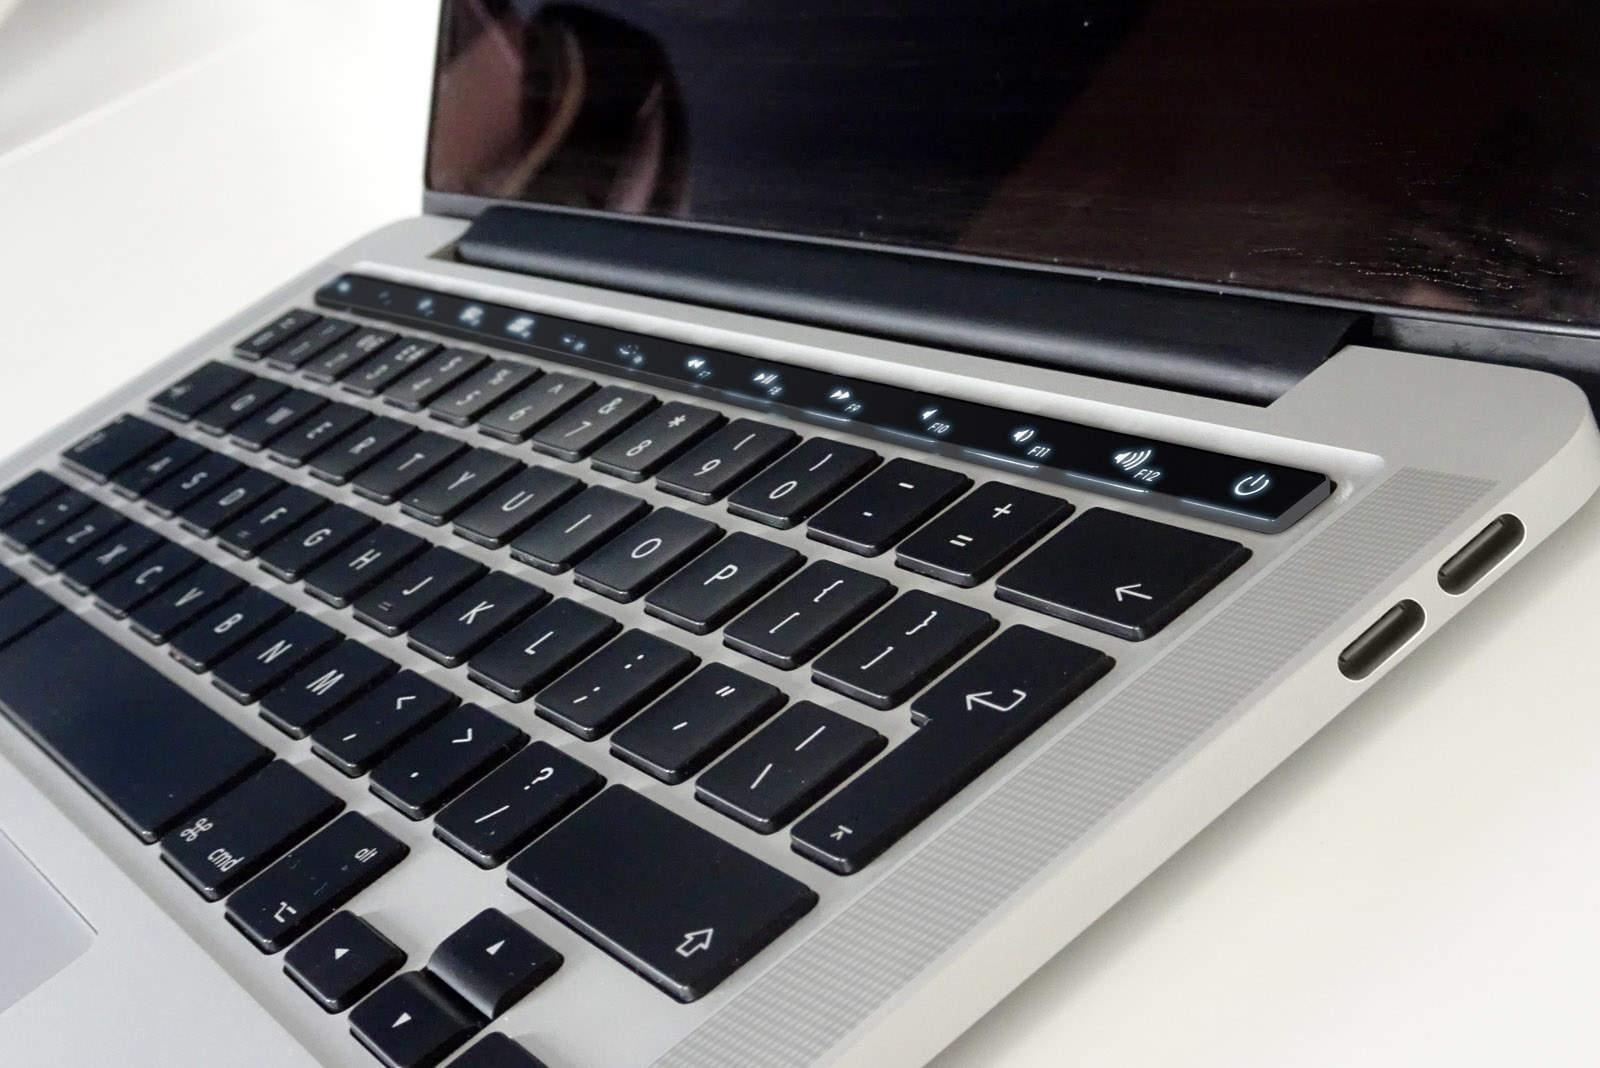 MacBook Pro OLED mockup